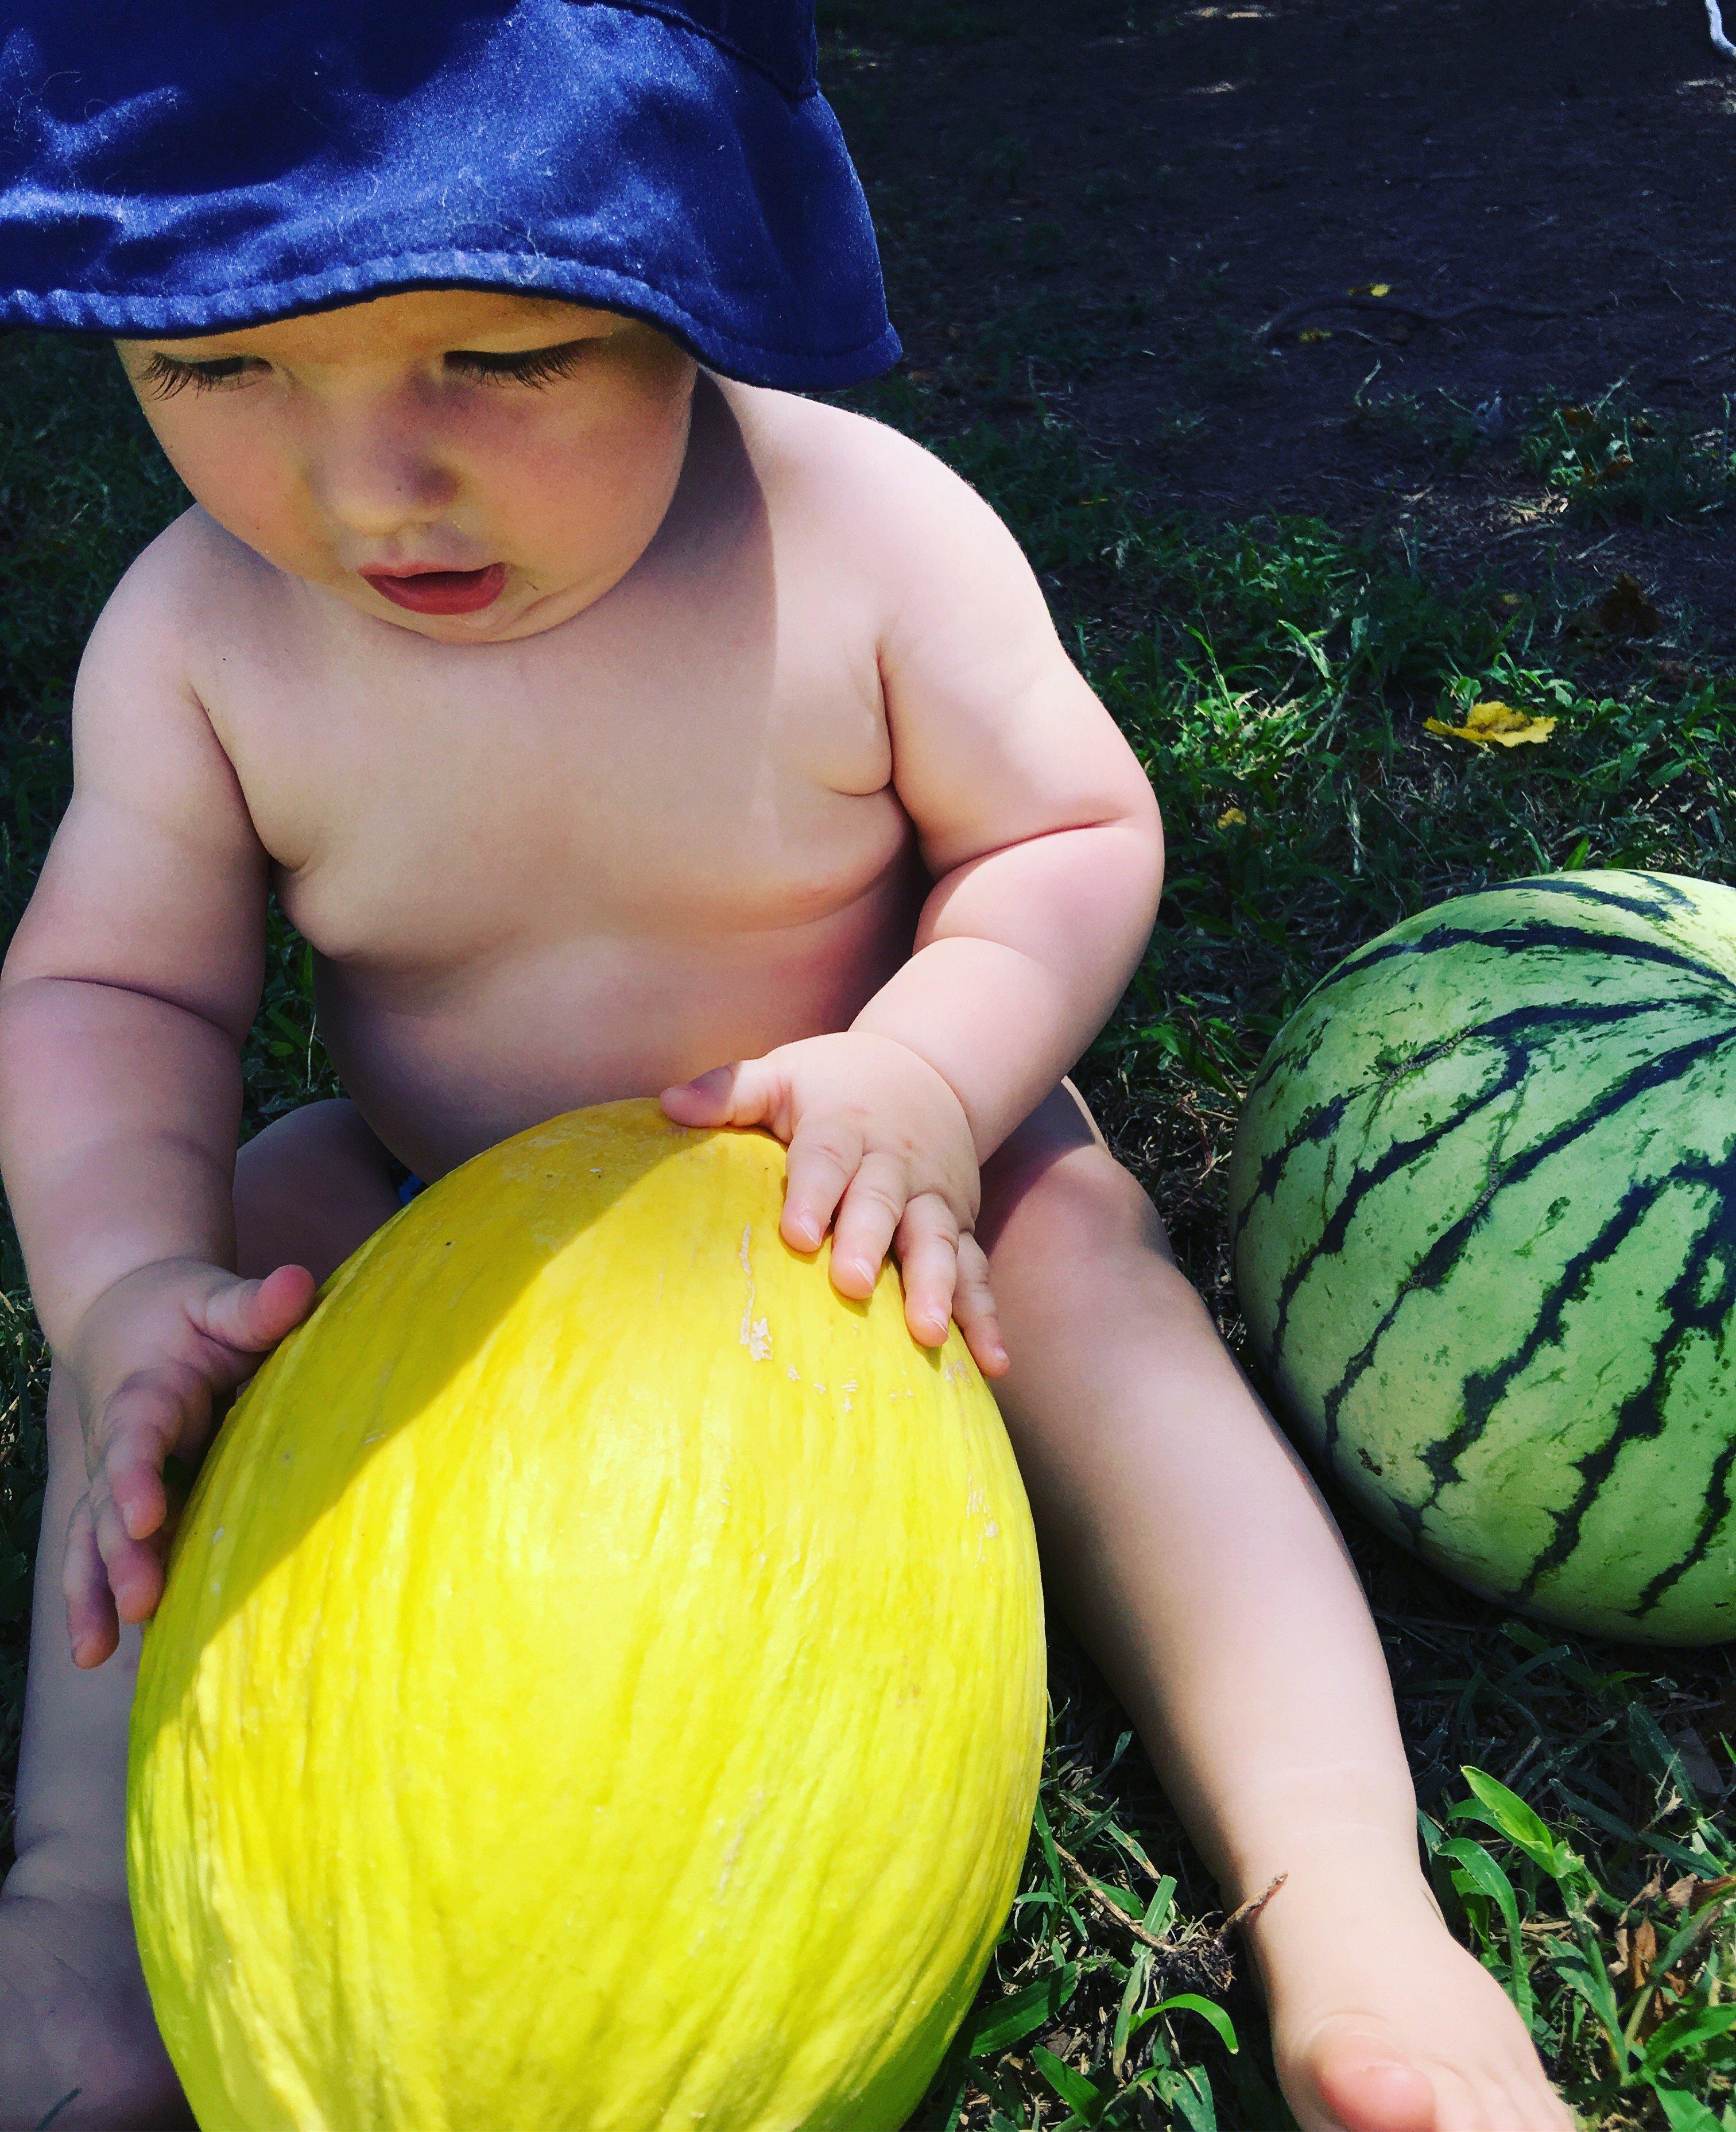 Harvesting garden melons